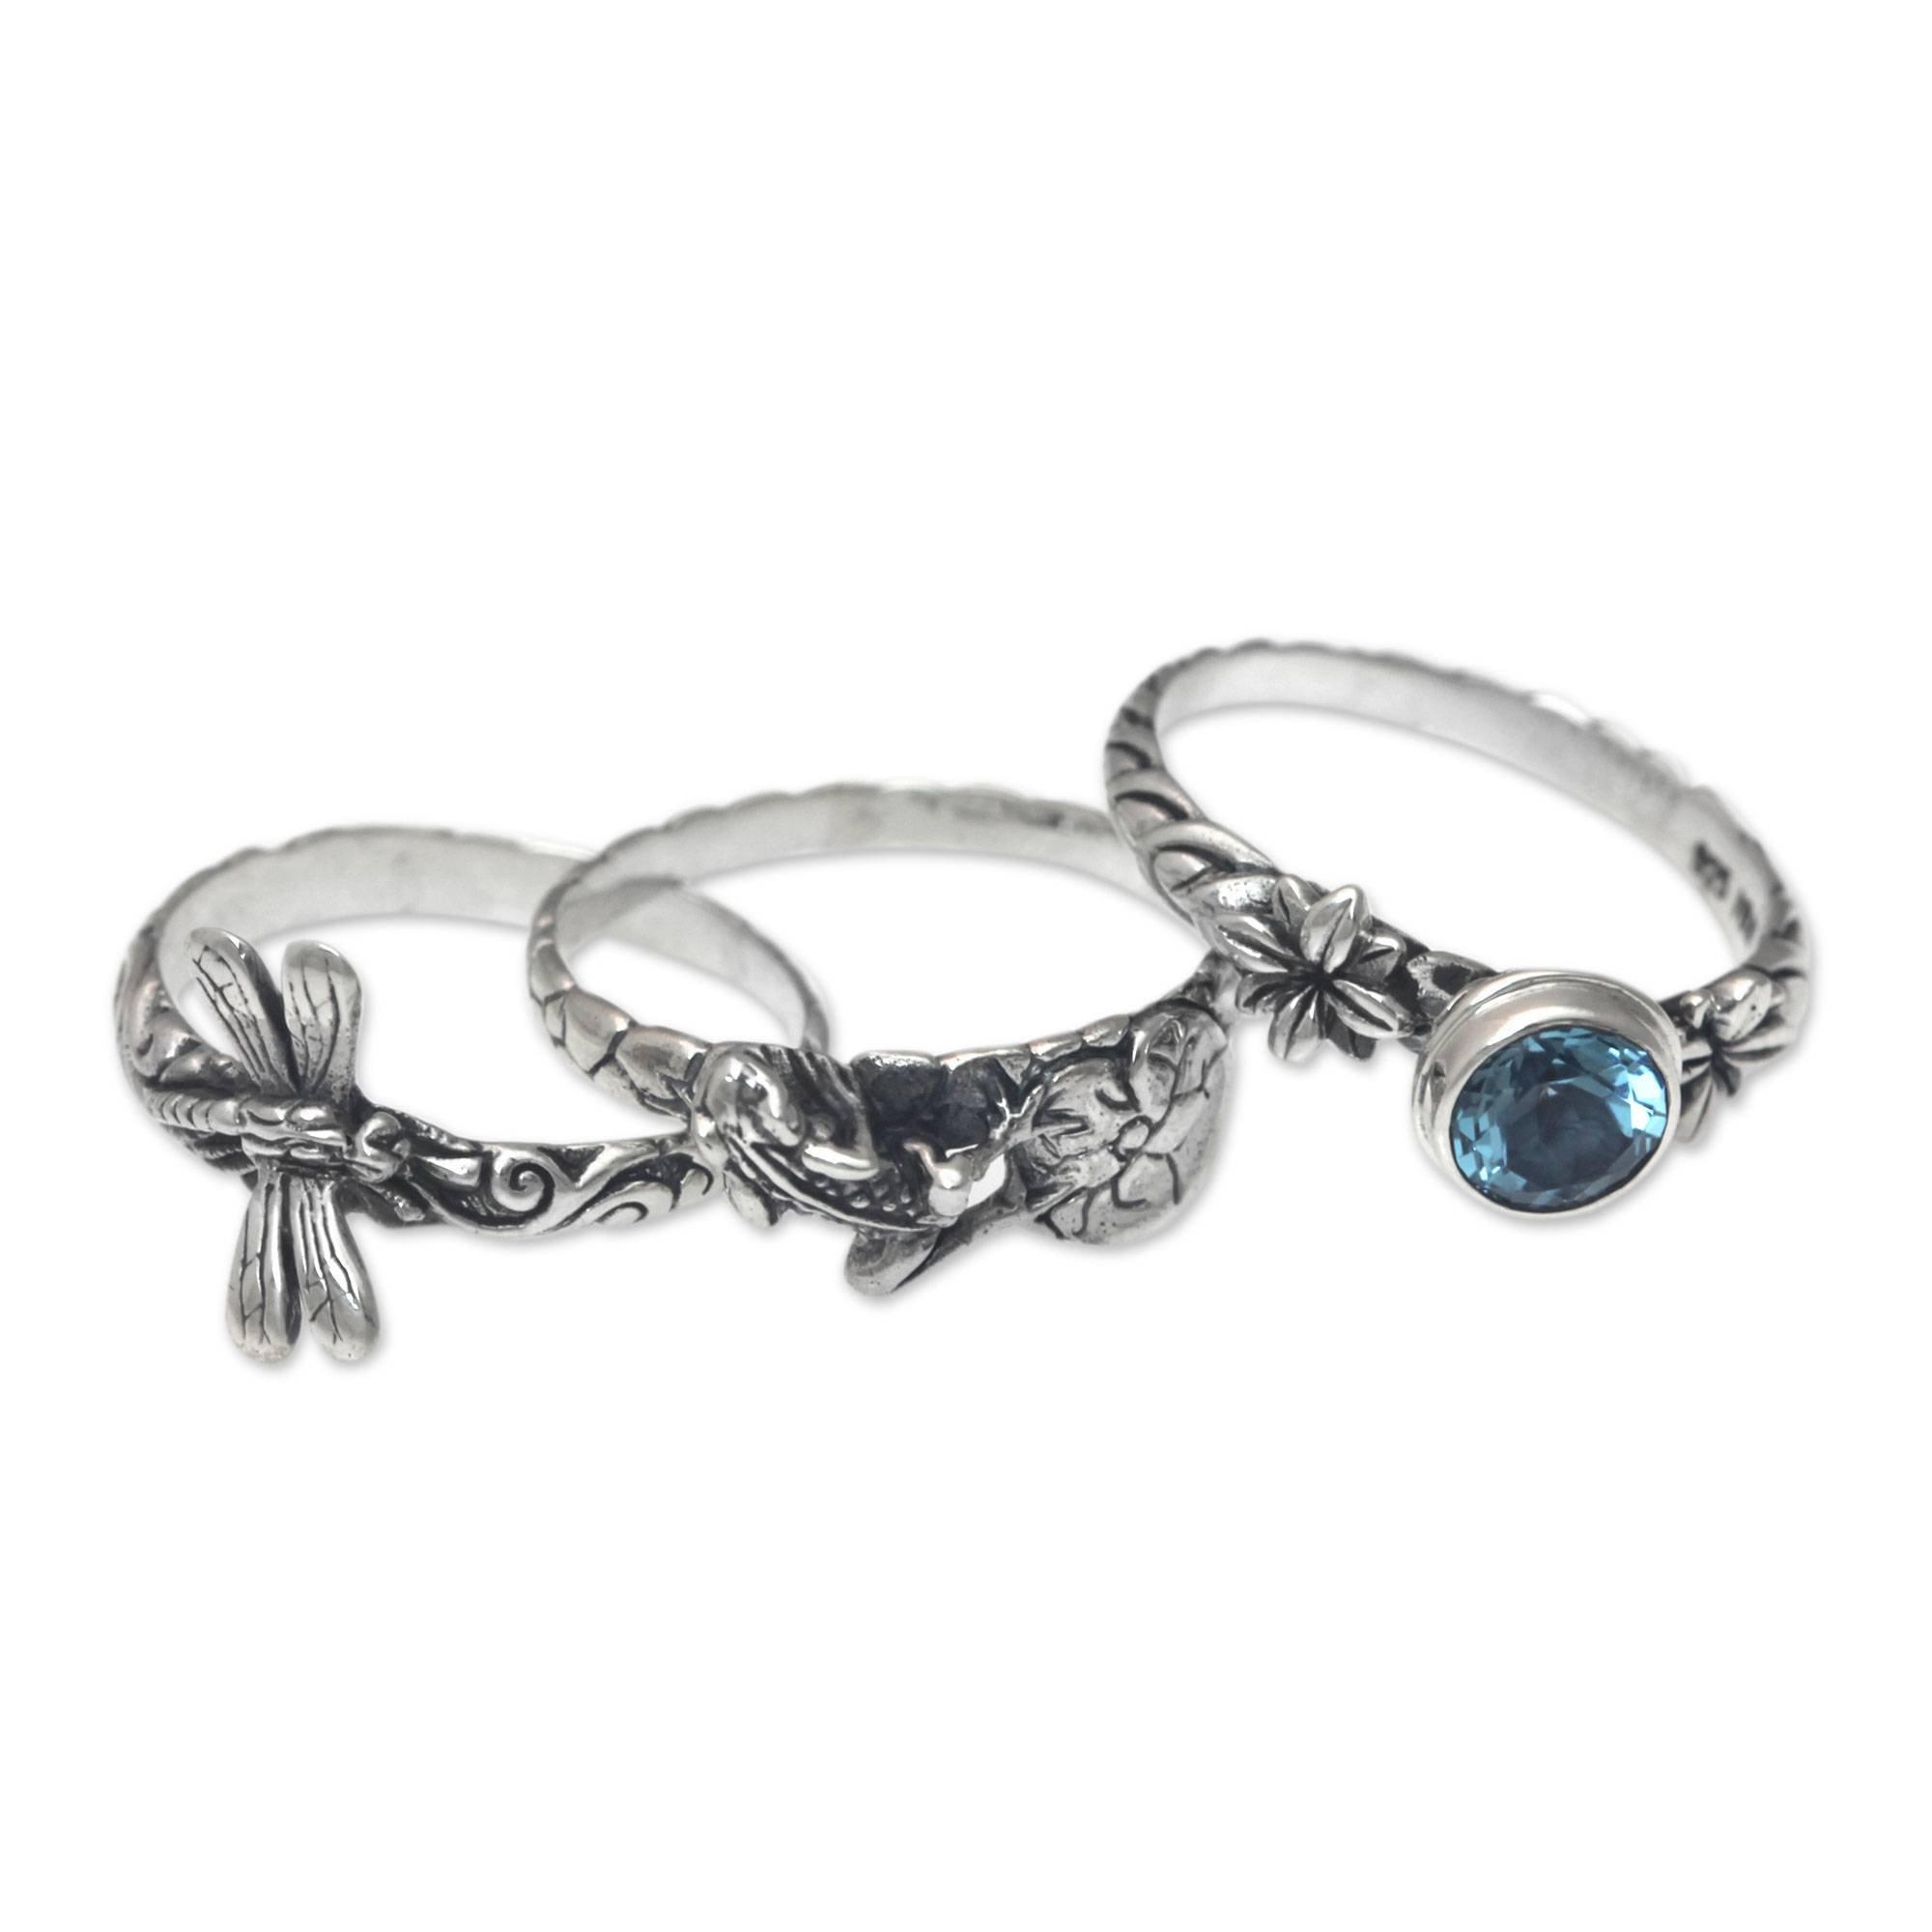 NOVICA Blue Topaz .925 Sterling Silver Dragonfly and Frog Stacking Rings, set of 3, Garden of Eden' by NOVICA